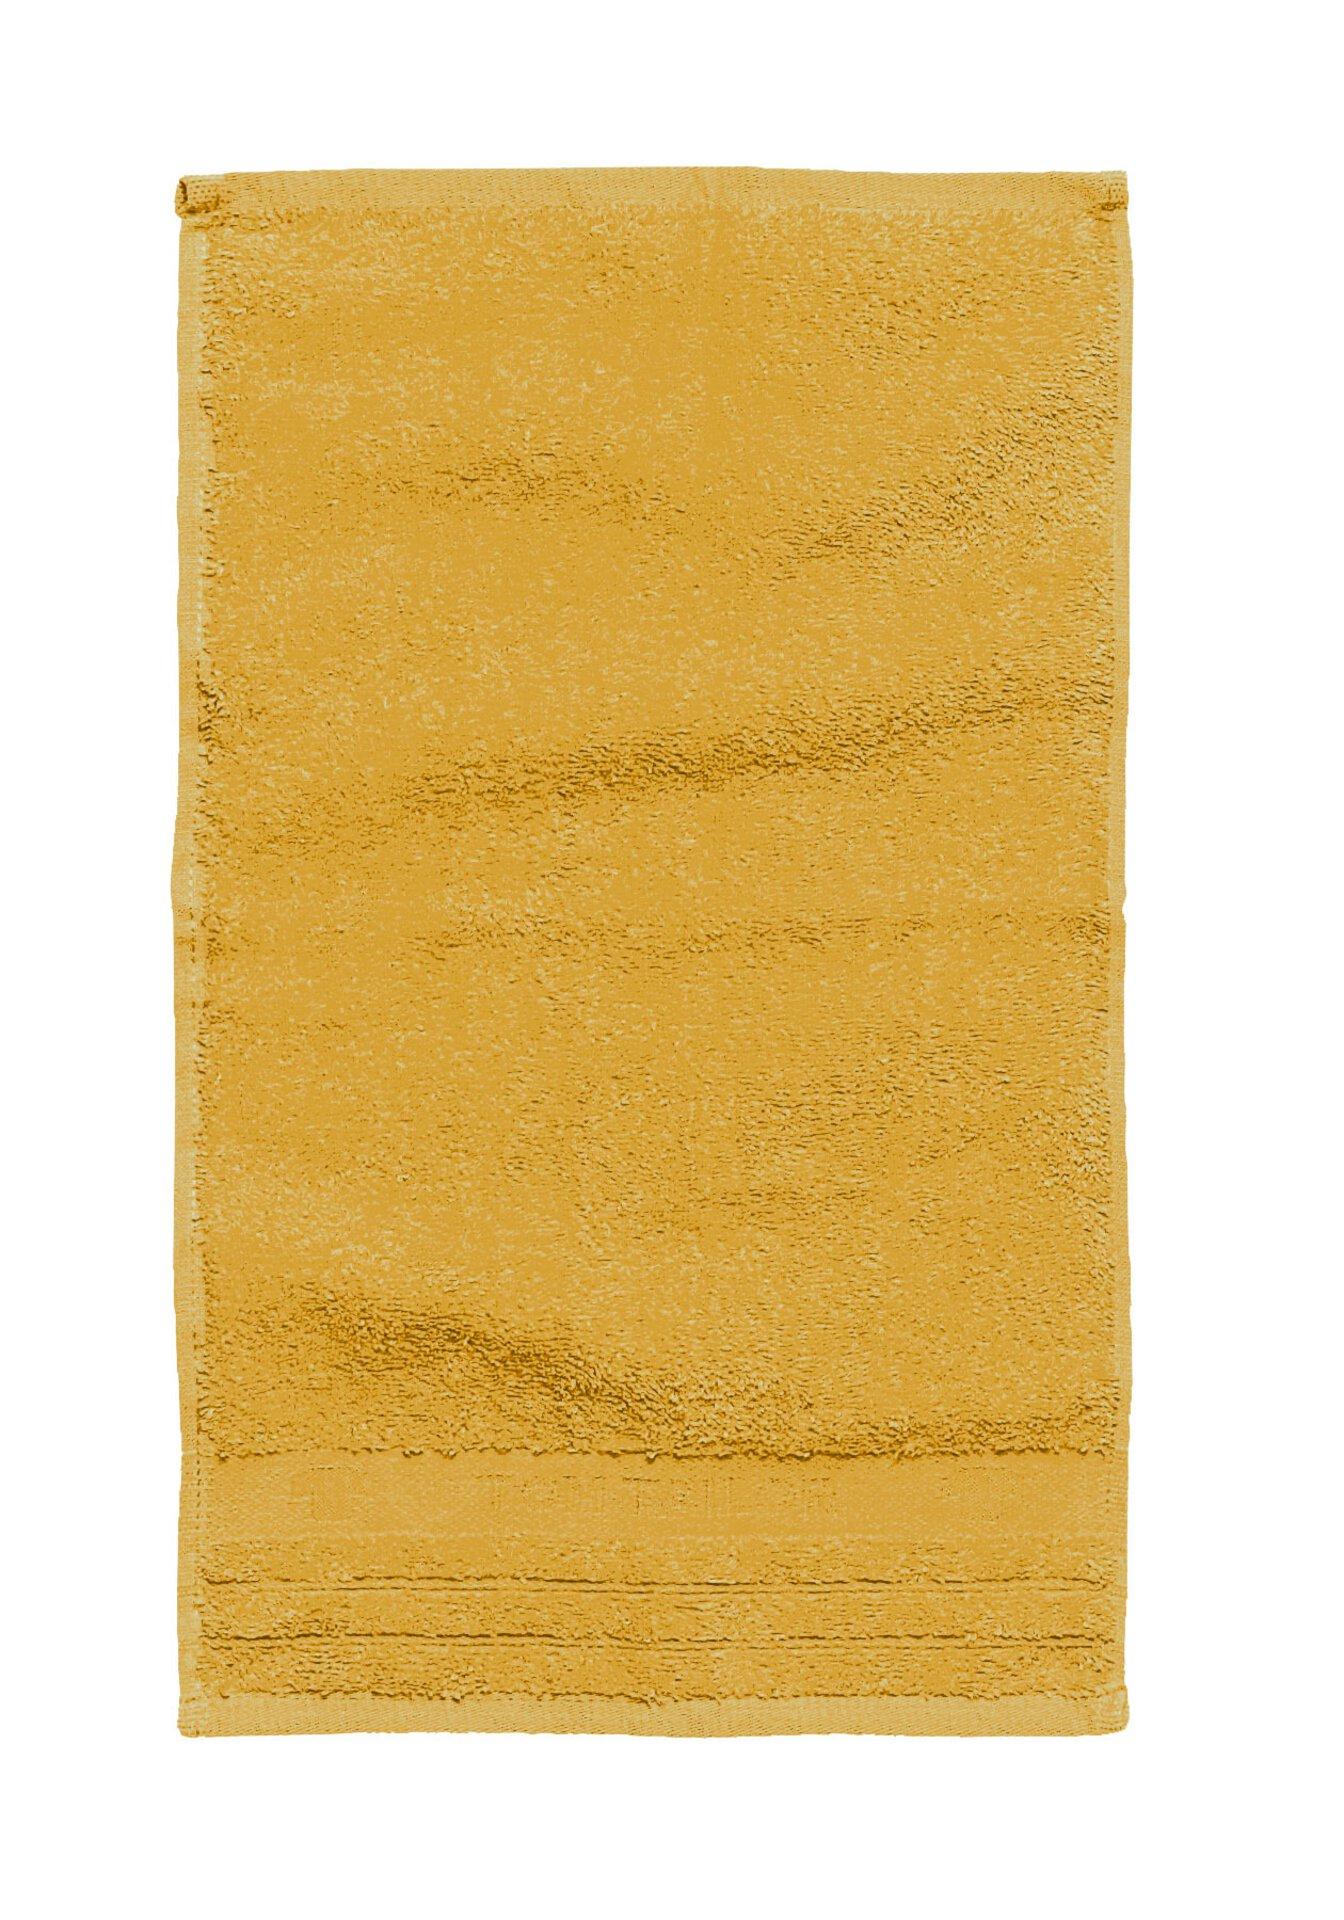 Gästetuch Uni Towel Tom Tailor Textil gelb 30 x 50 cm